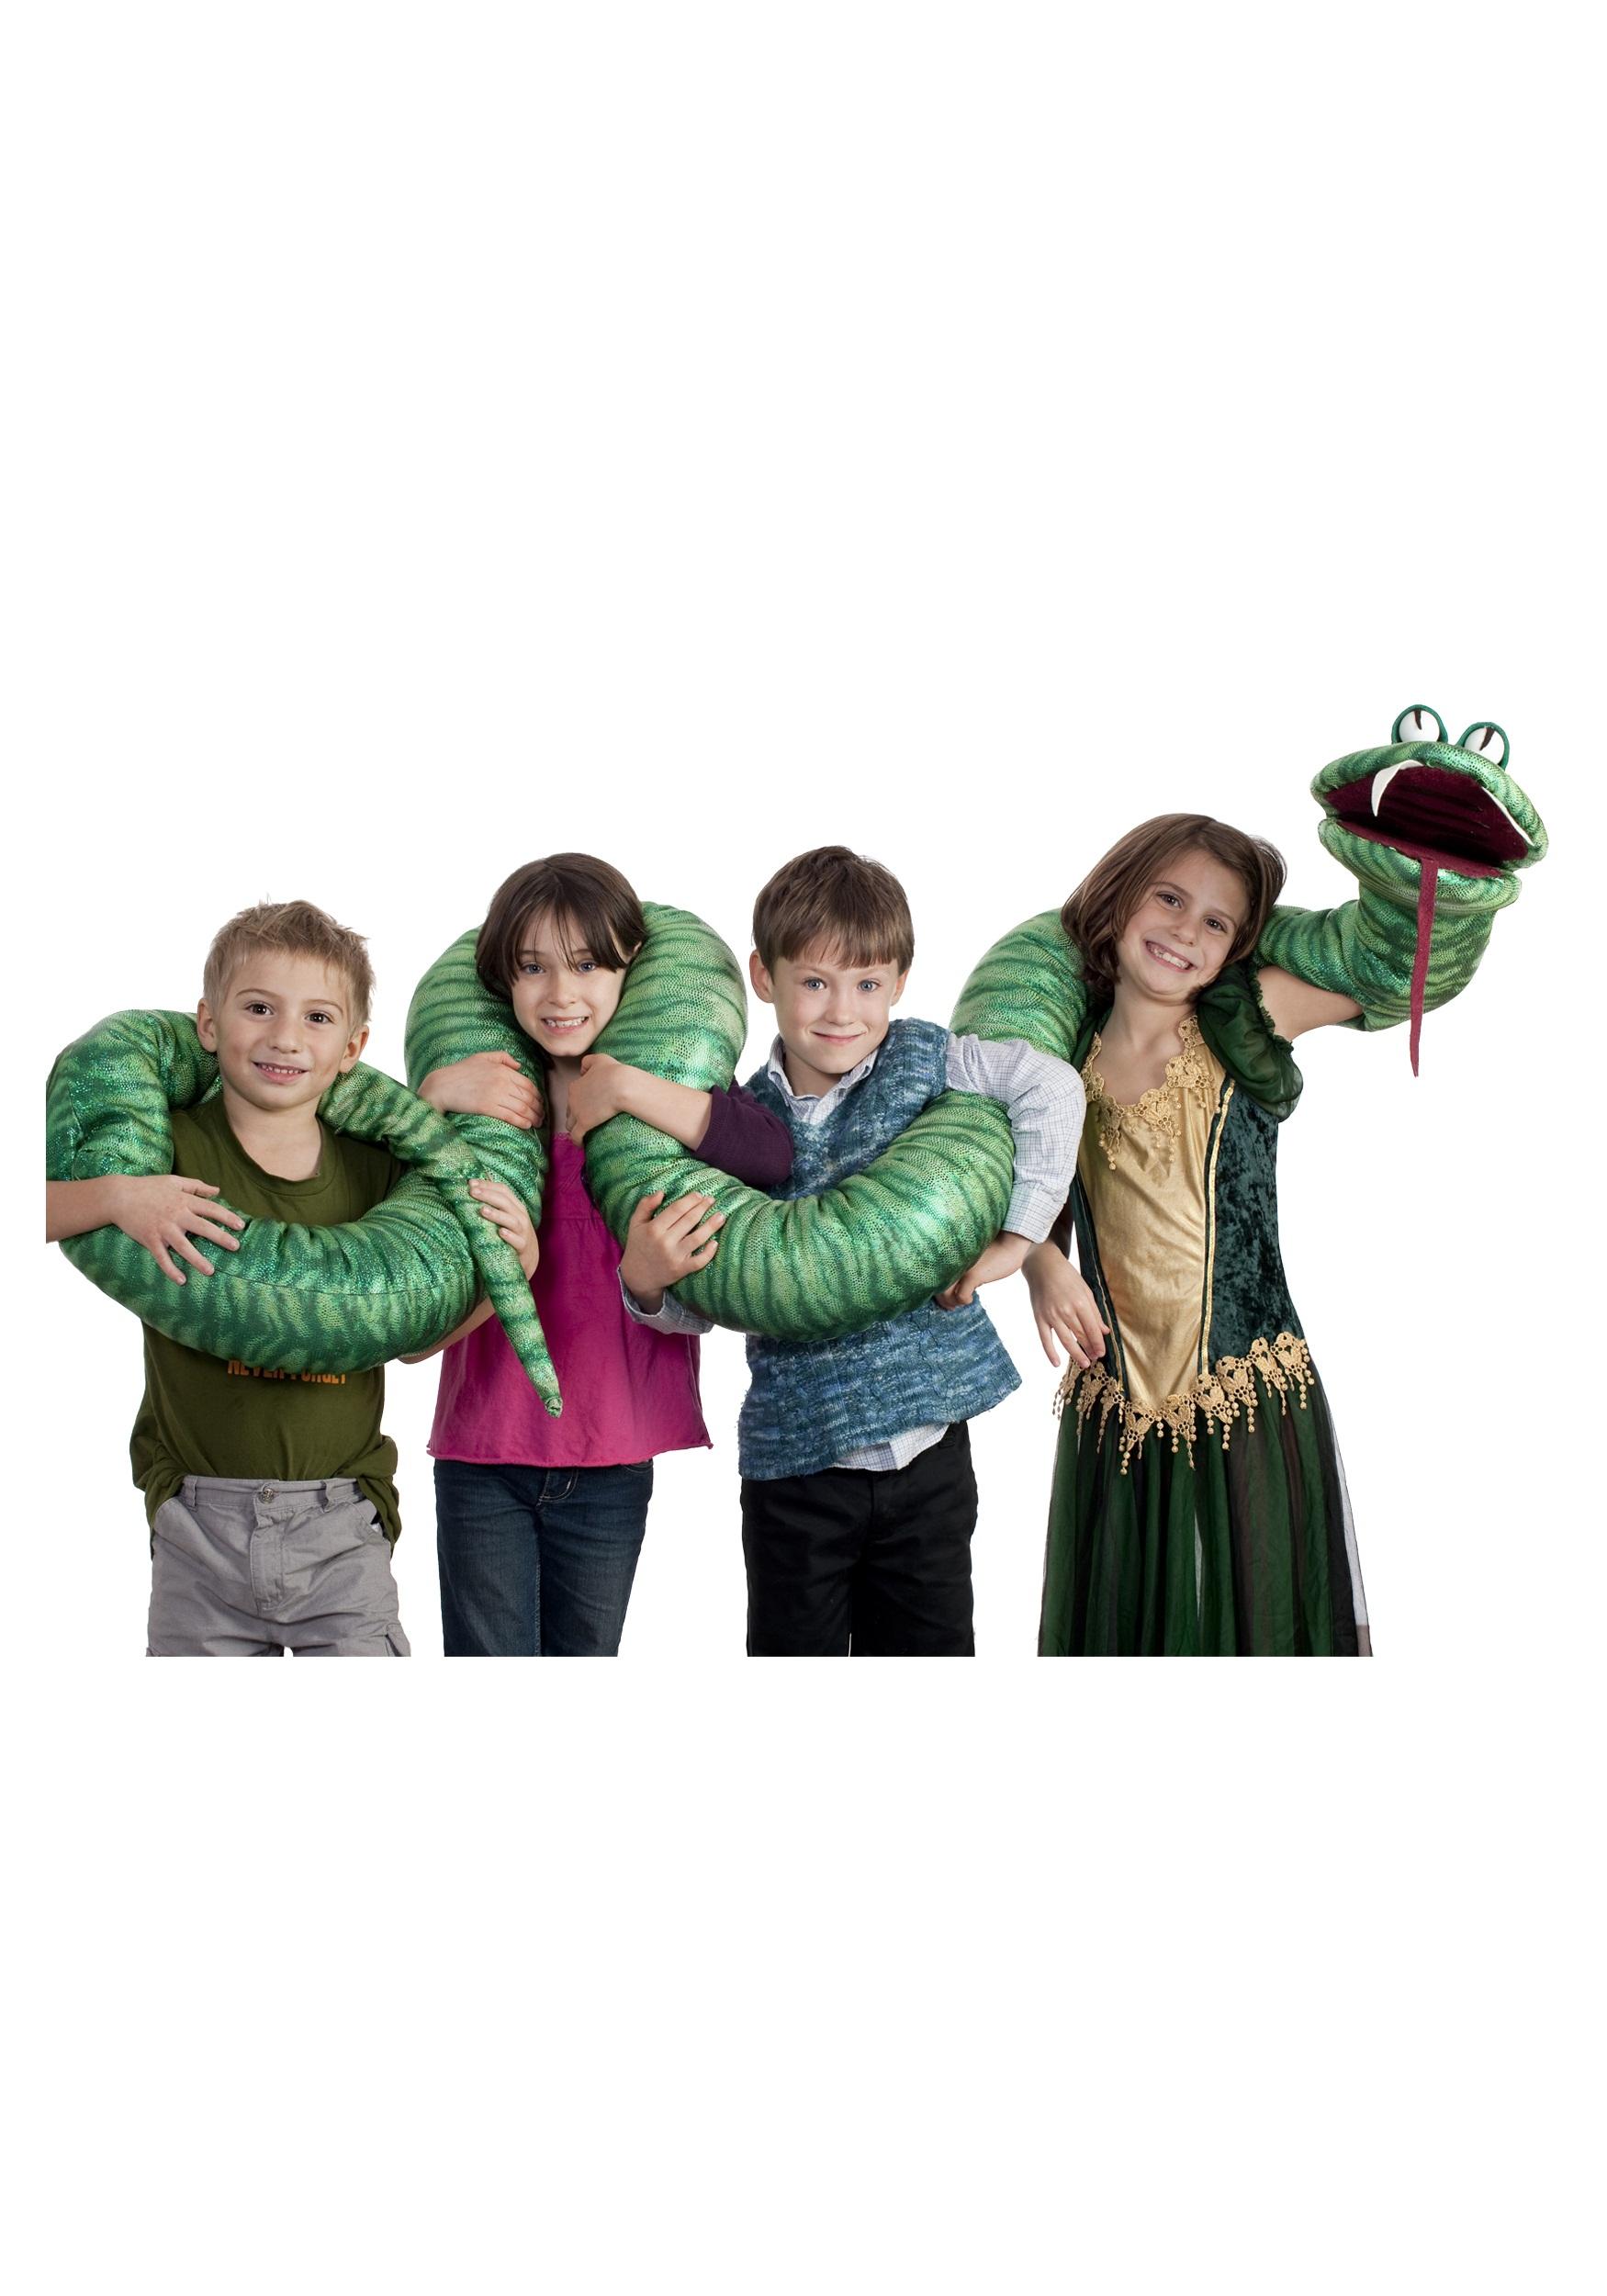 Big Snake Arm Puppet  sc 1 st  Halloween Costume & Big Snake Arm Puppet - Funny Costume Ideas for Adults